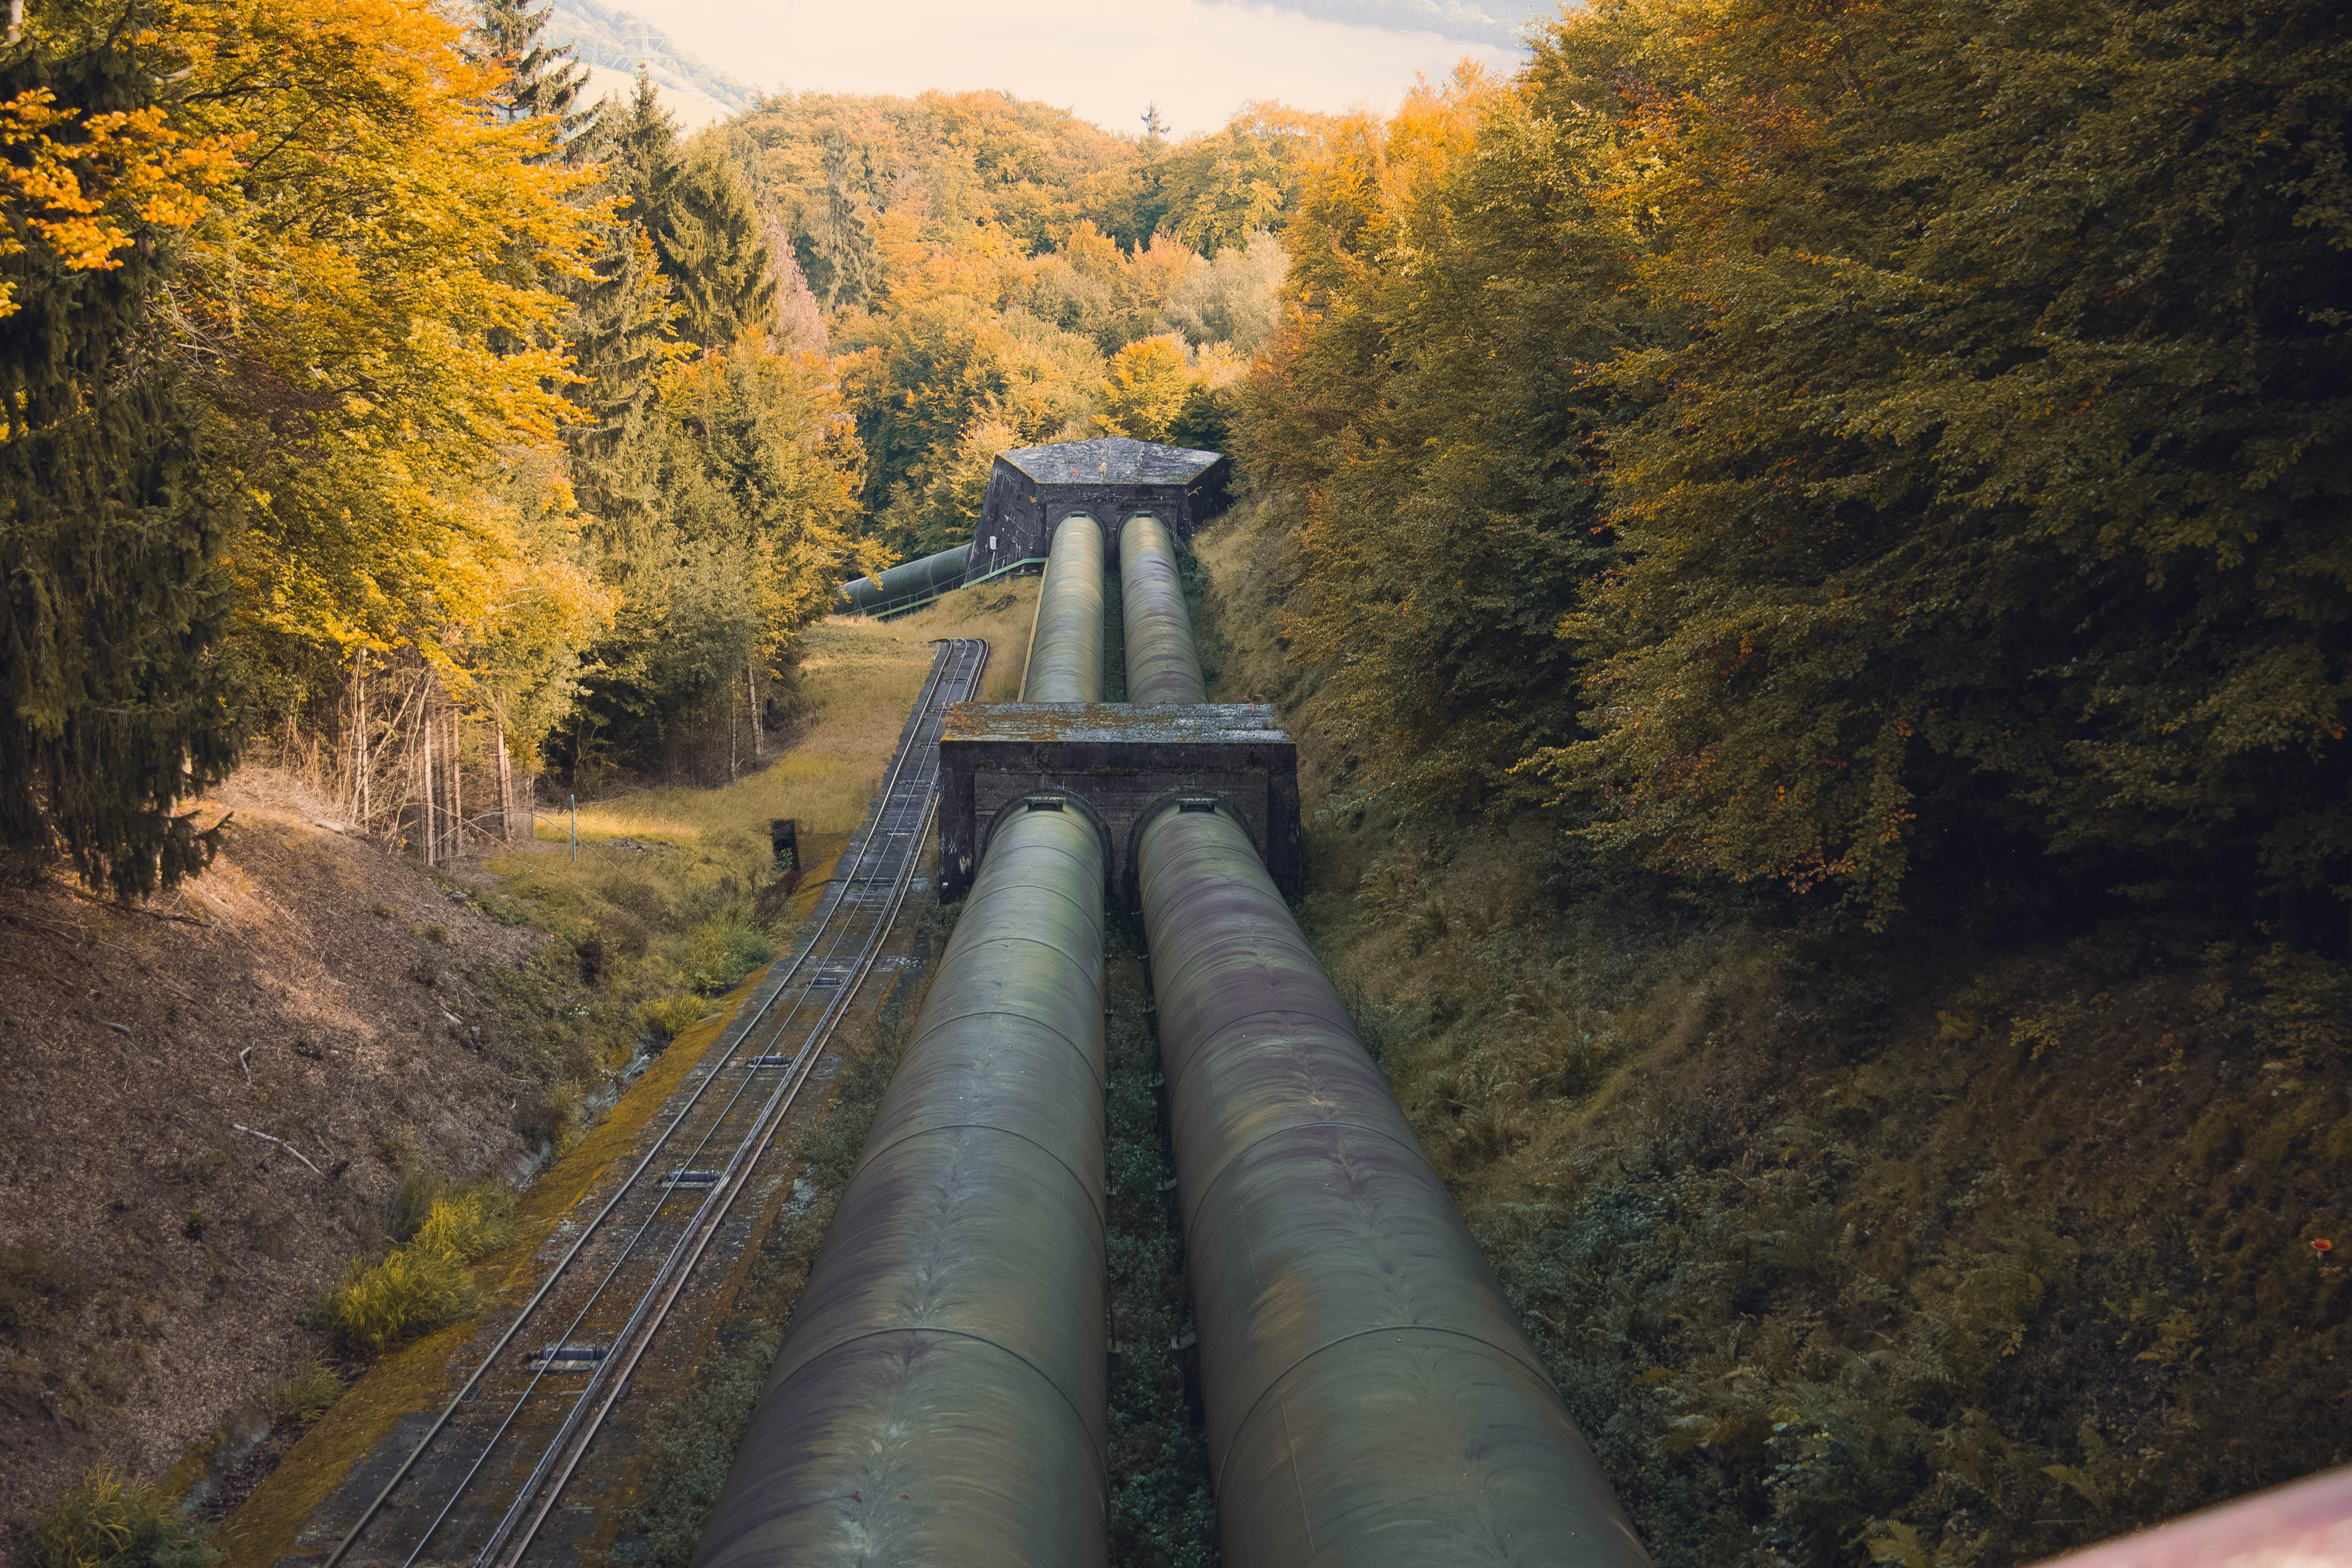 Sunoco Pipeline Penalties Could Benefit Lebanon County Streams